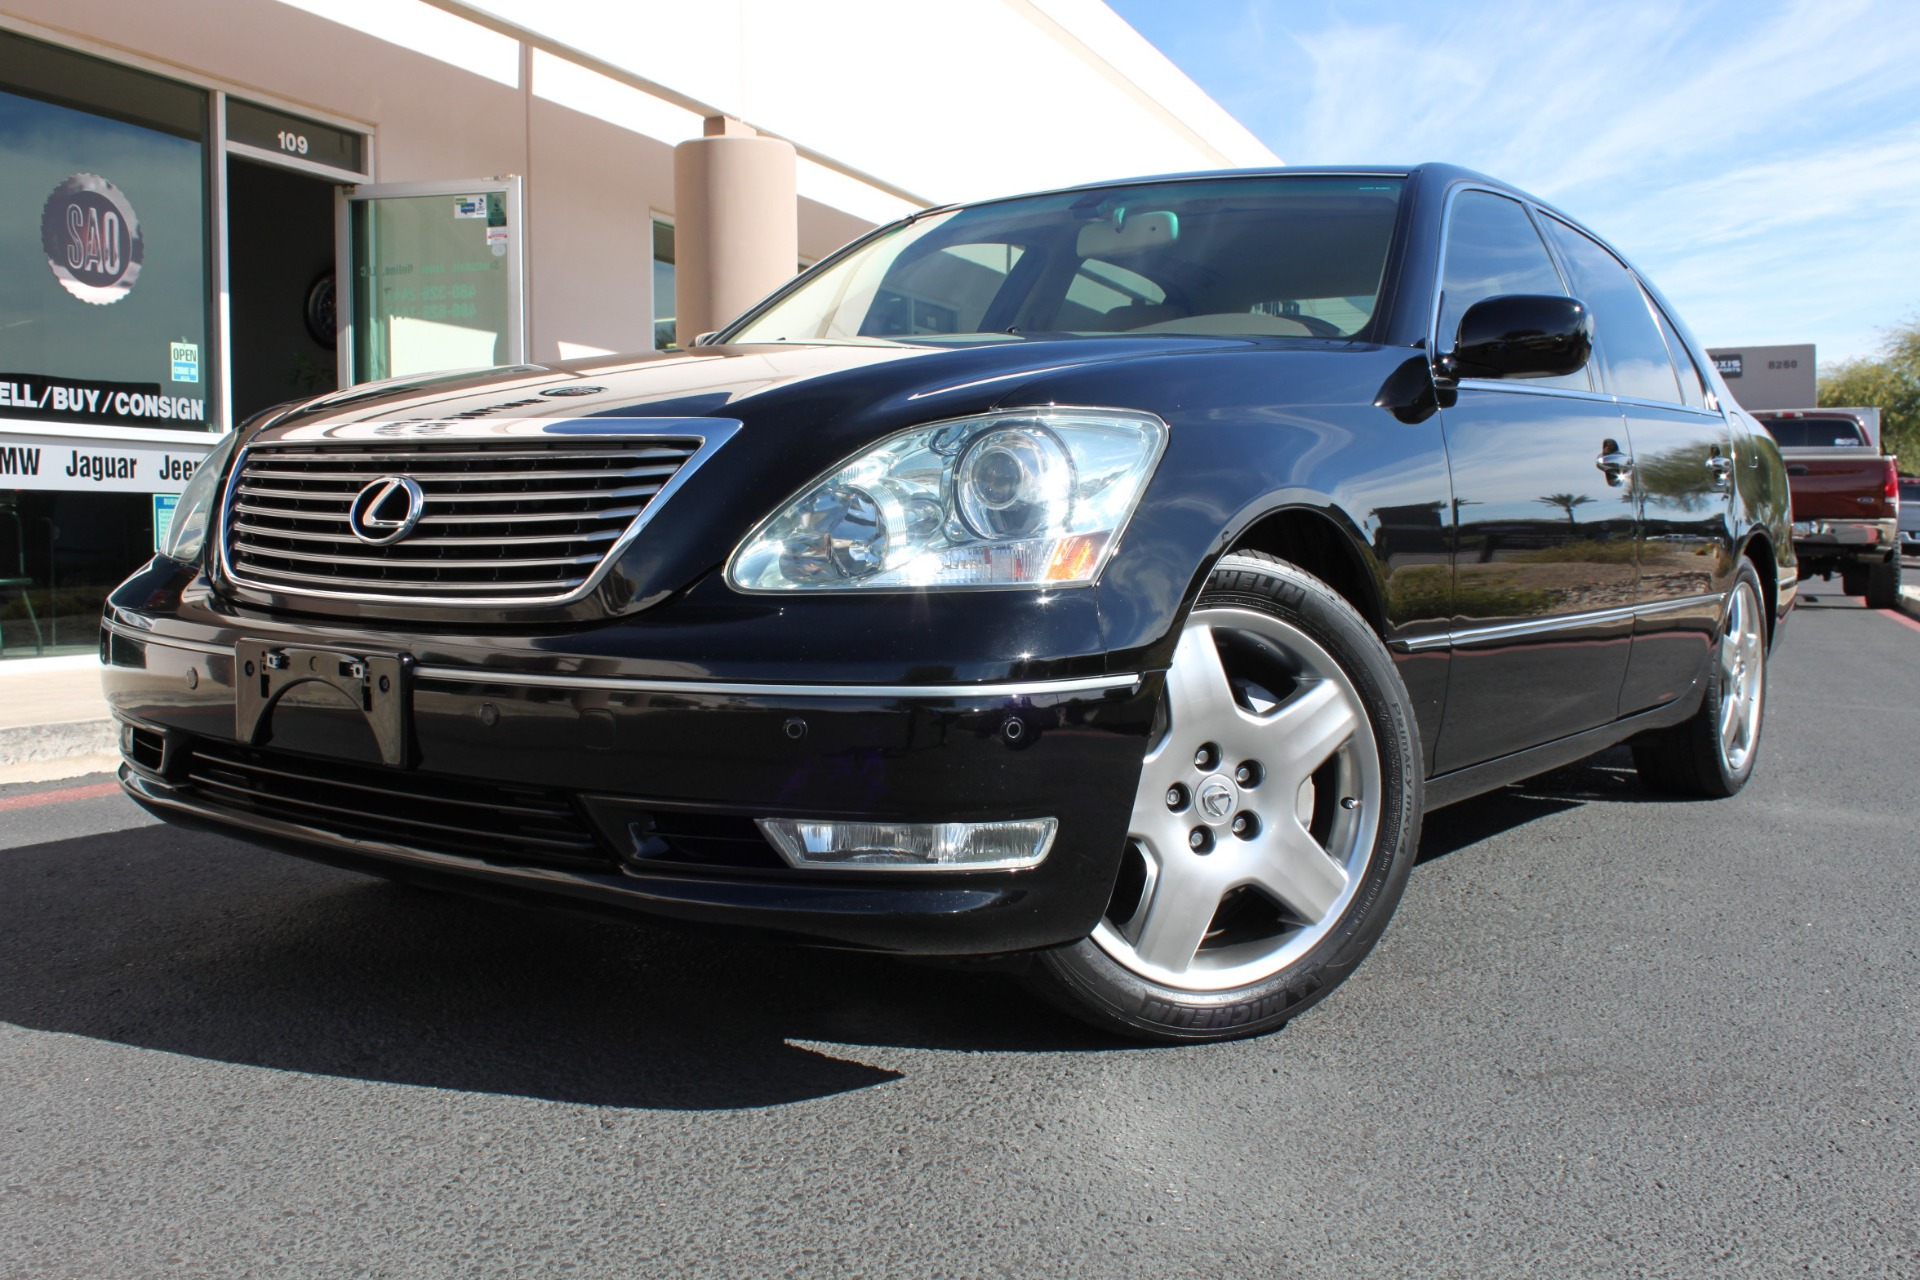 sale for lexus black sedan used car htm